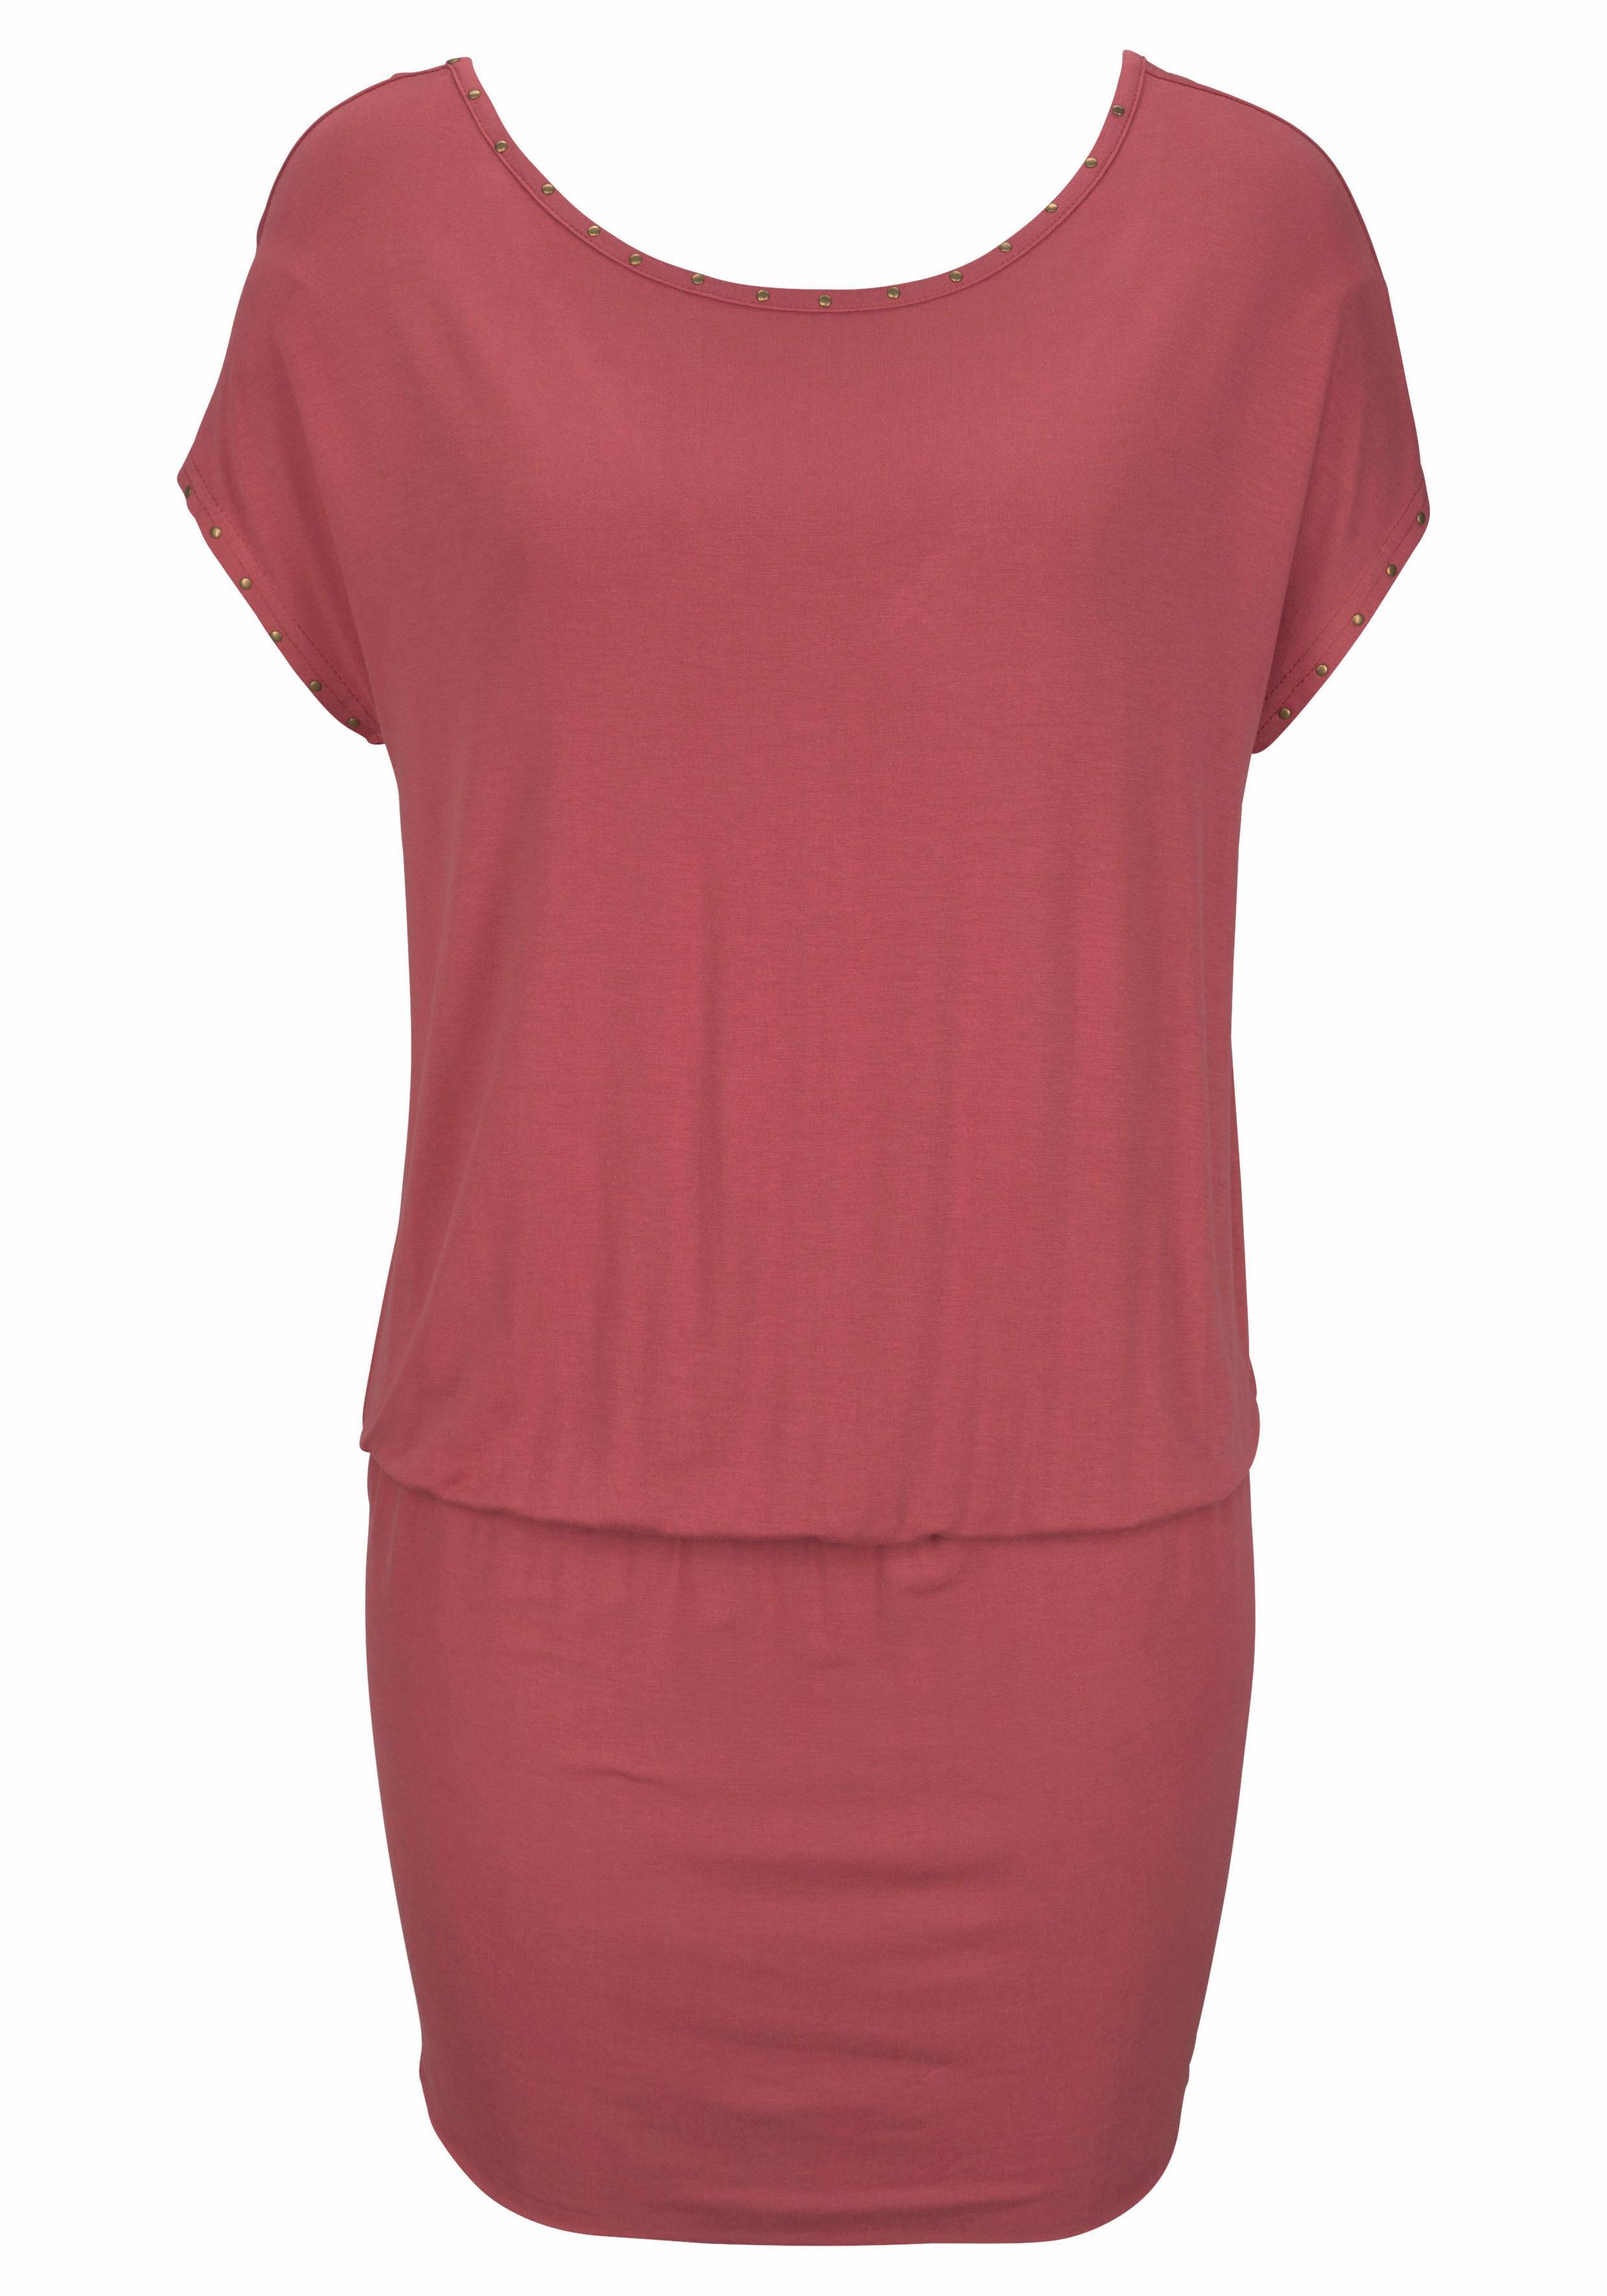 LASCANA Longshirt | Bekleidung > Shirts > Longshirts | Lascana